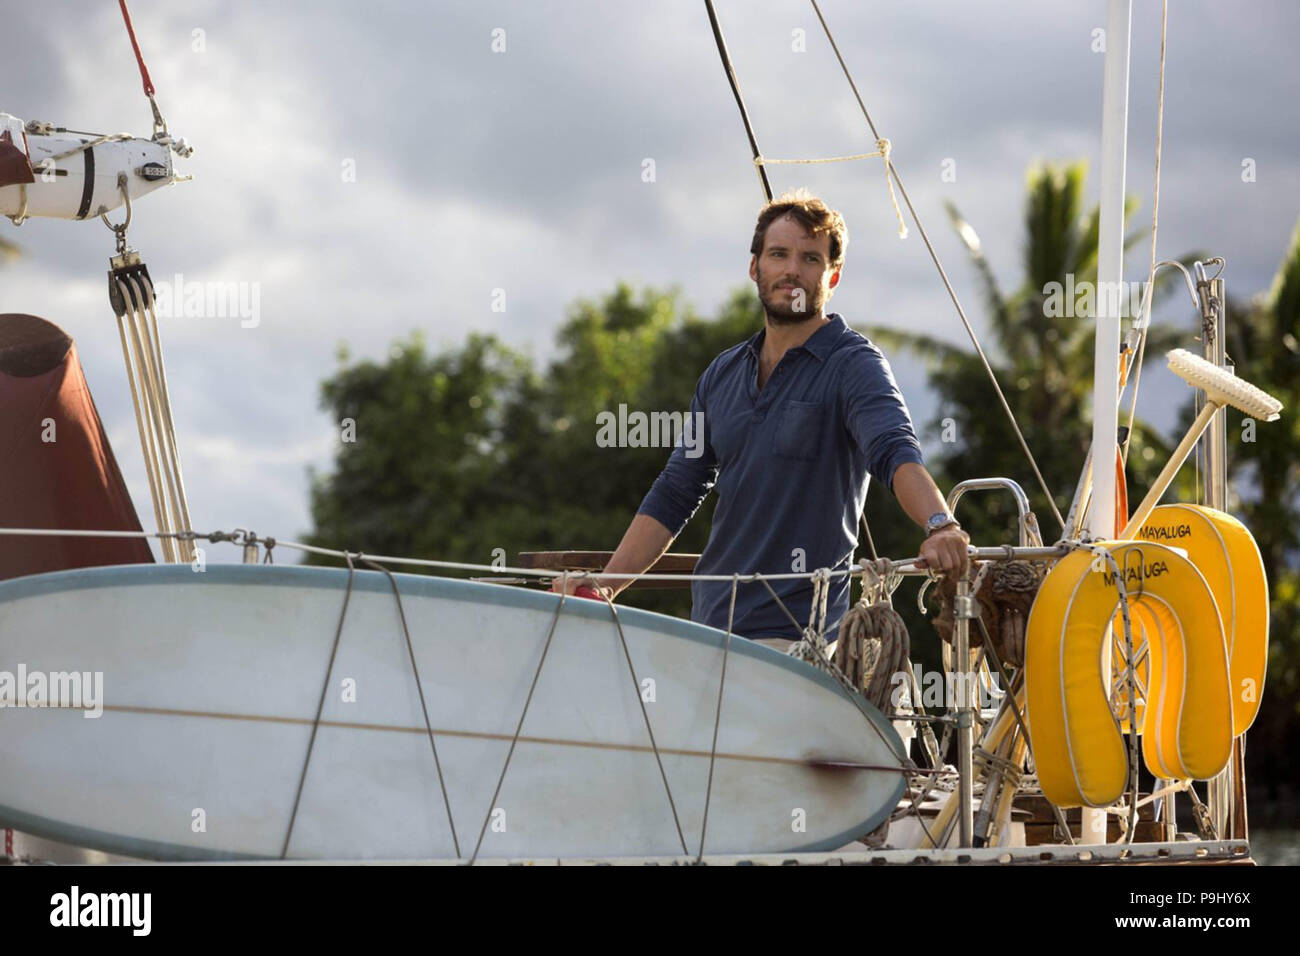 Download Film Adrift 2018